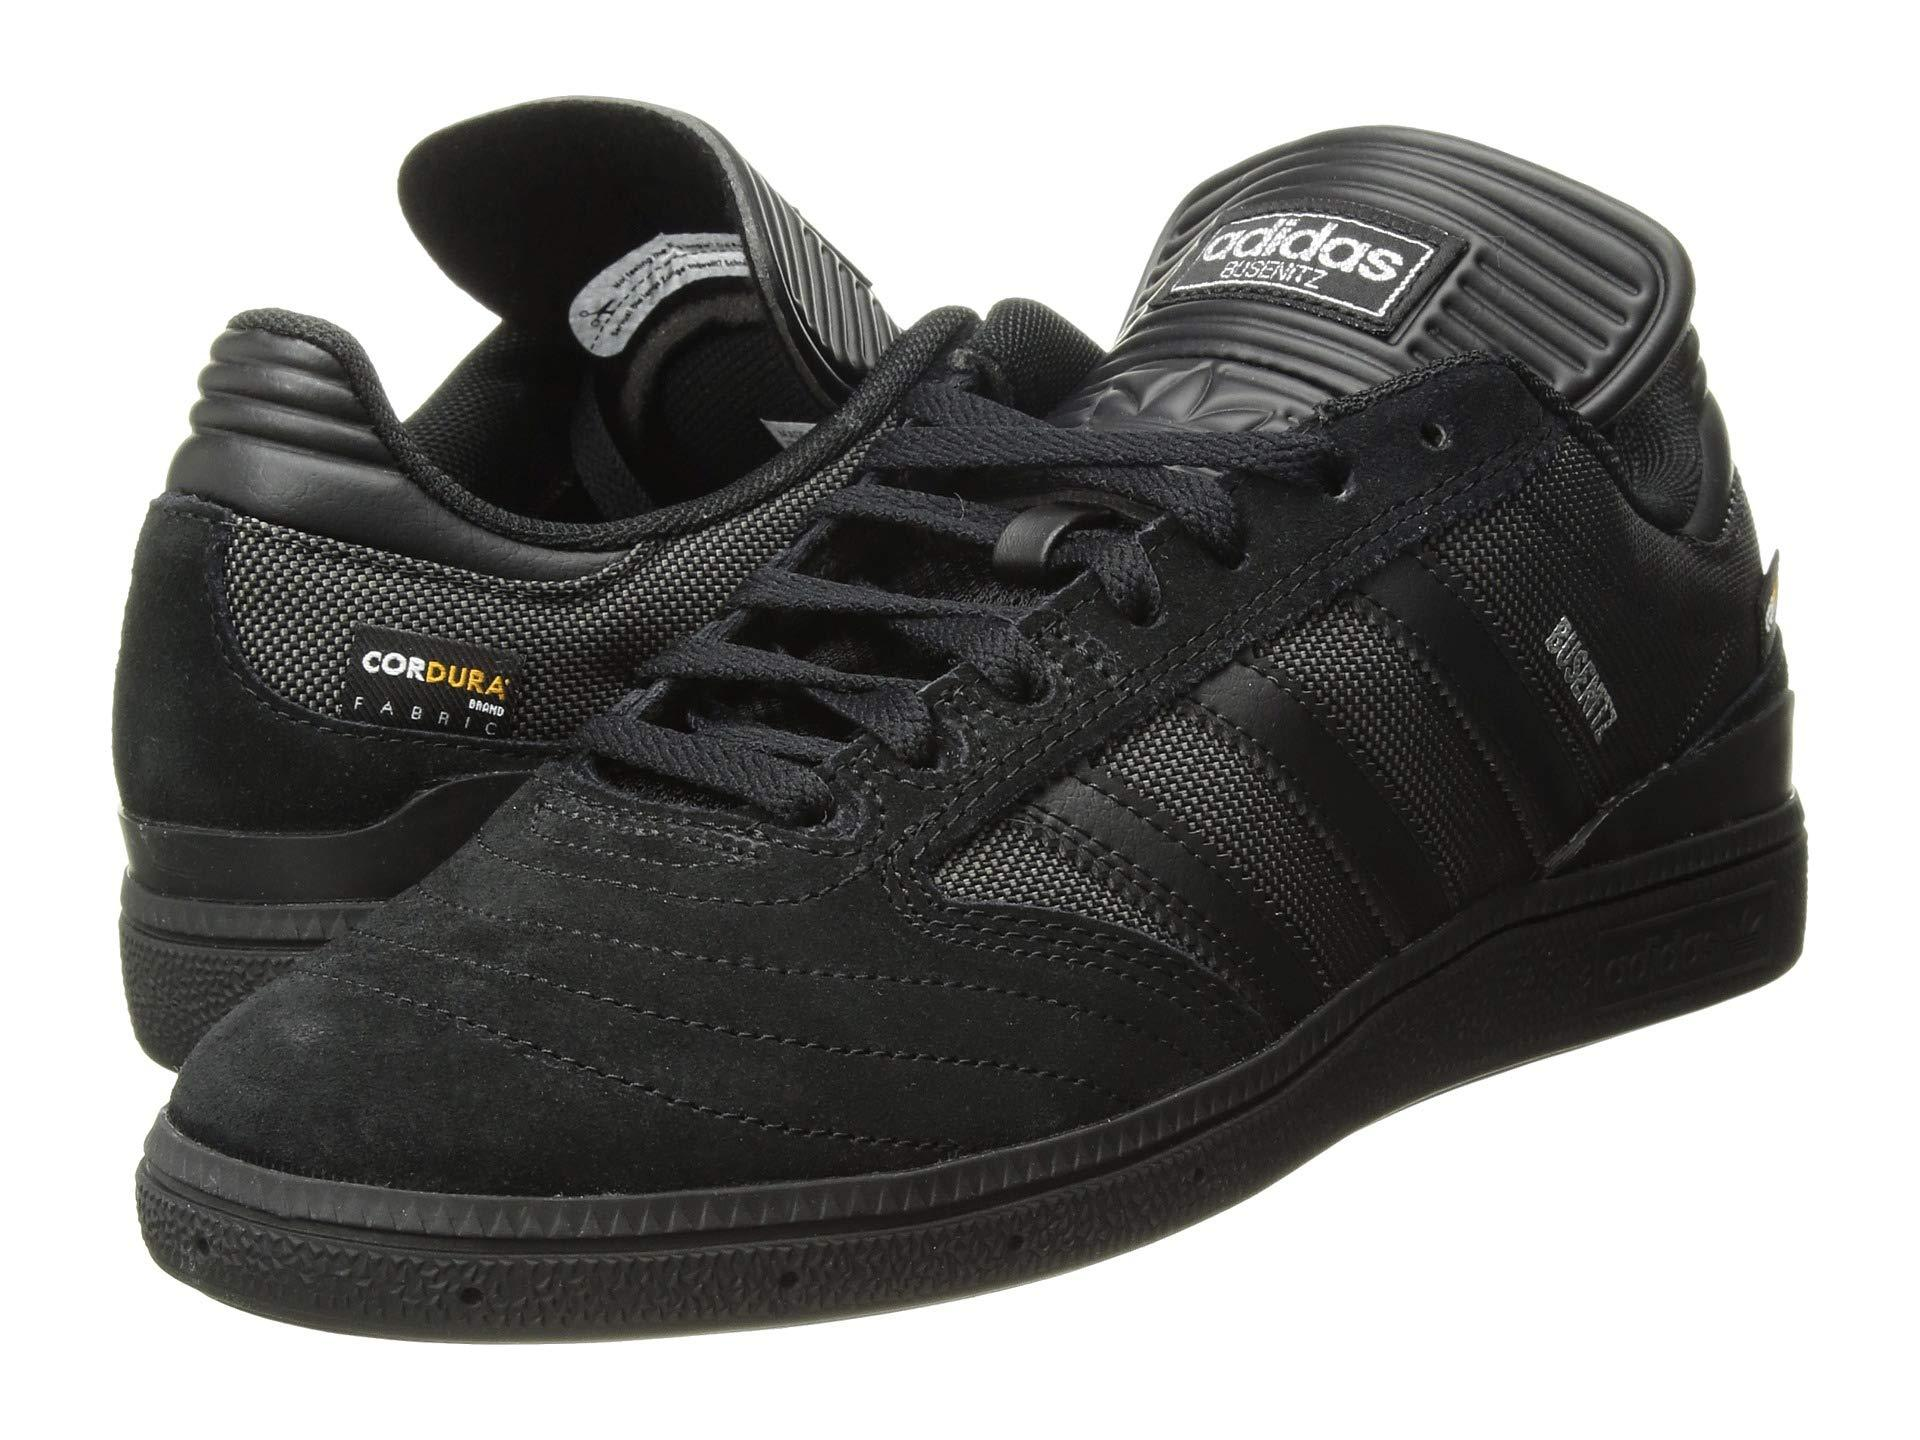 0a9d4f6ead1 adidas Originals. Black Busenitz Pro (footwear White collegiate  Burgundy clear Mint) Men s Skate Shoes